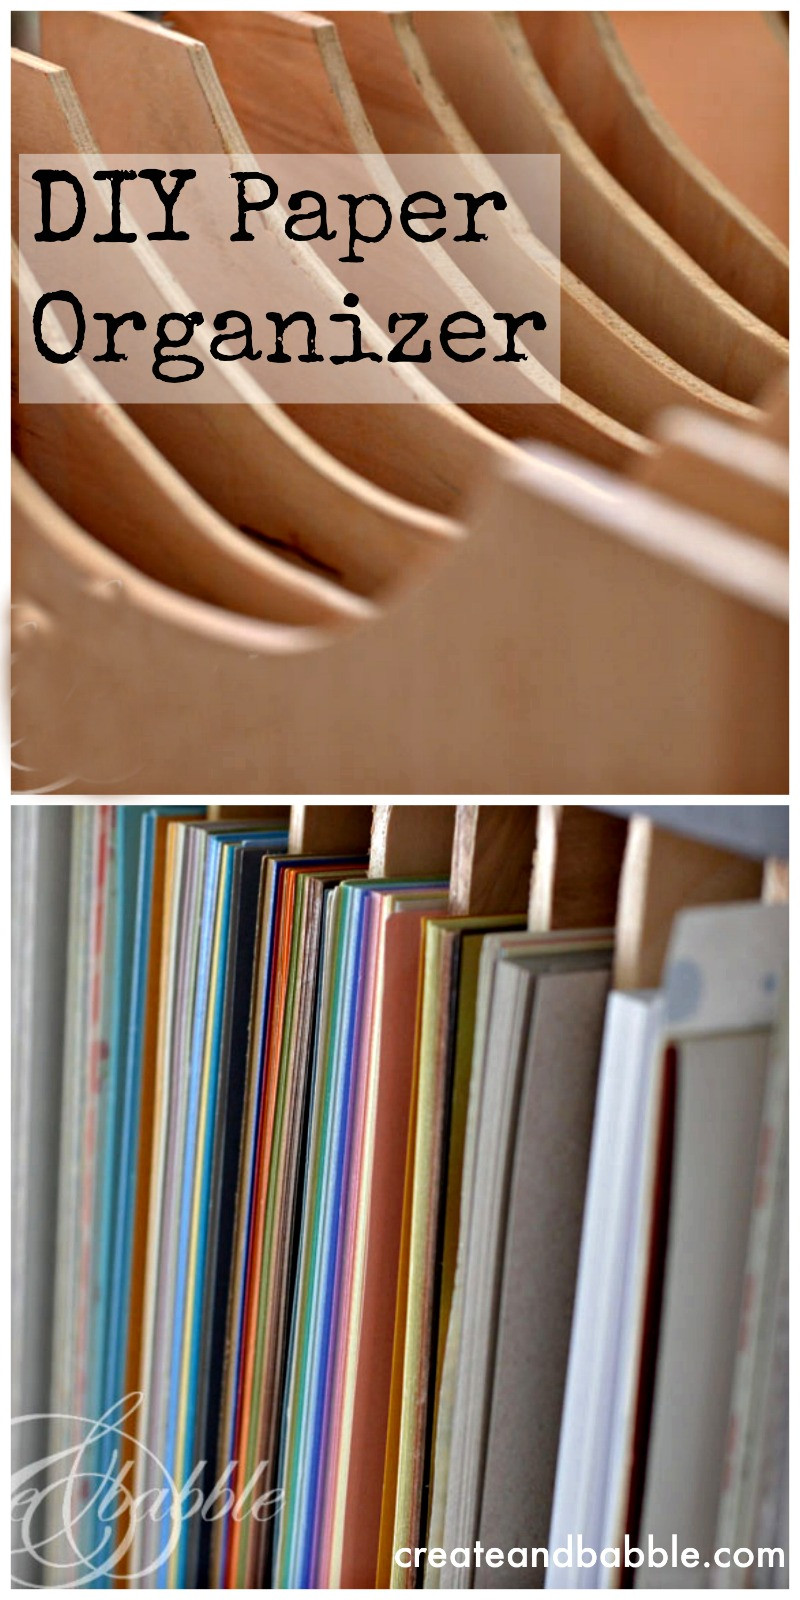 Paper Organizer DIY  DIY Paper Organizer for Cubbie Storage Units